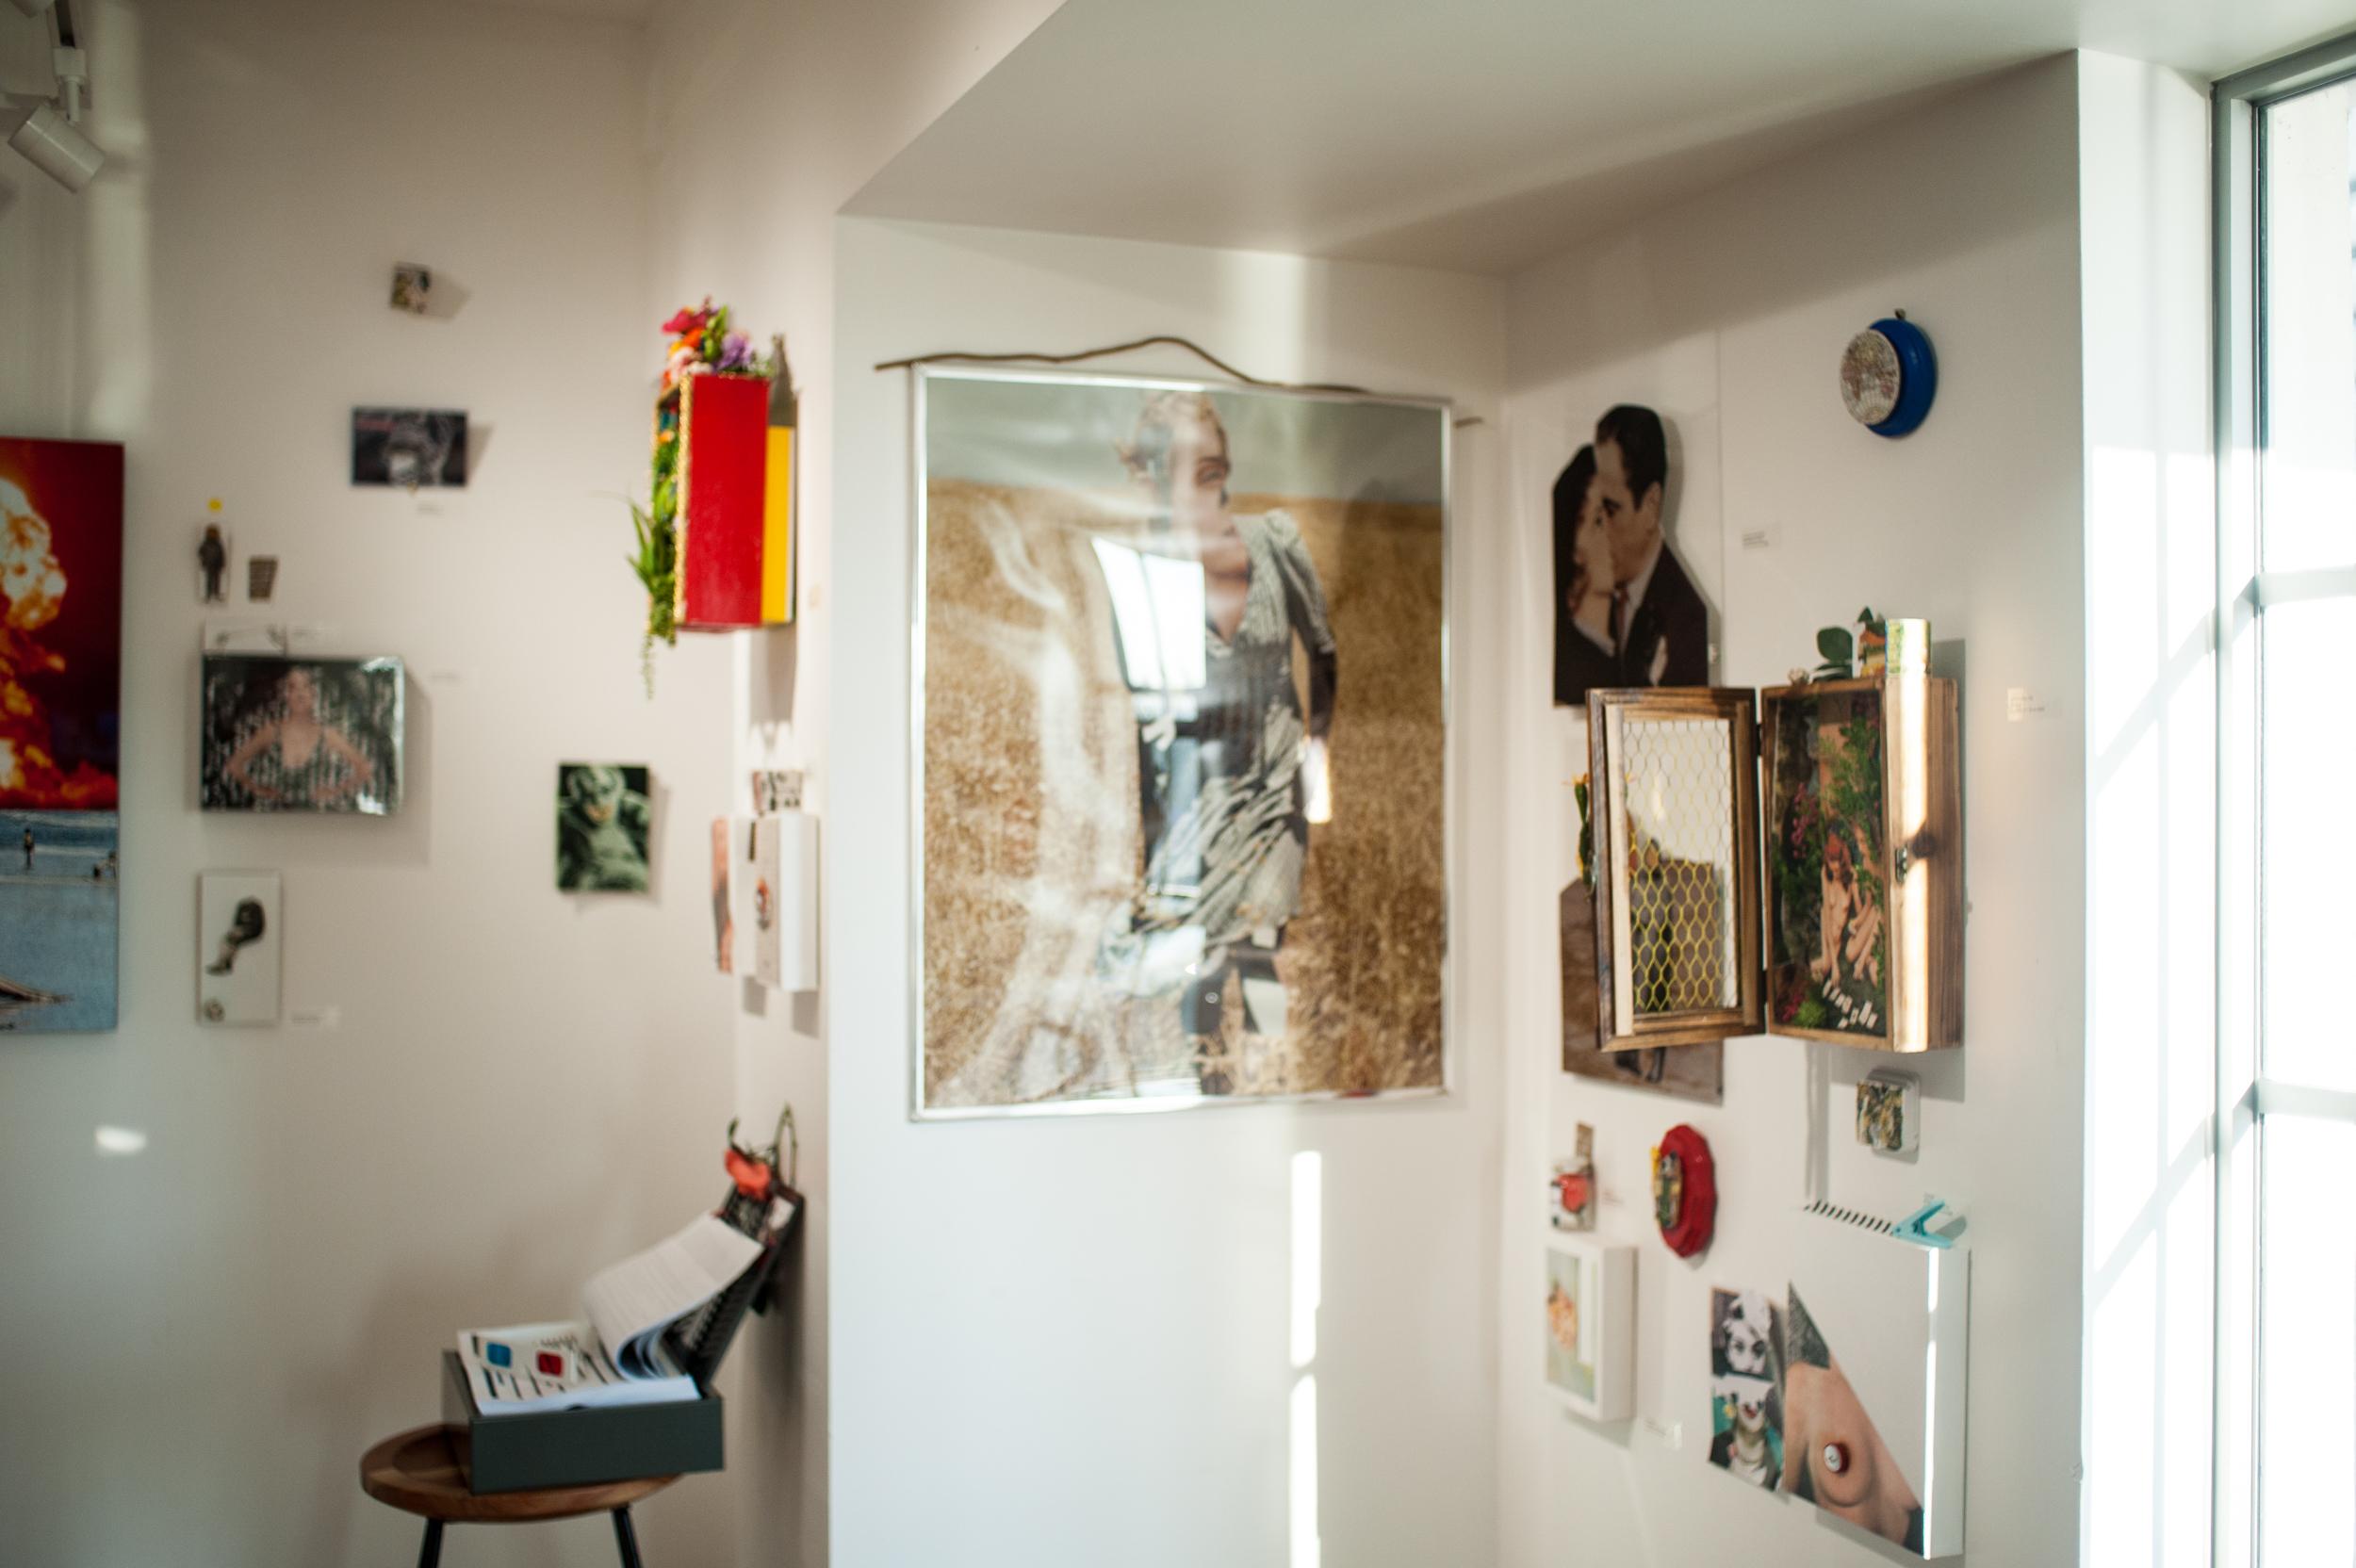 Faena-Exhibition-Images-16.jpg